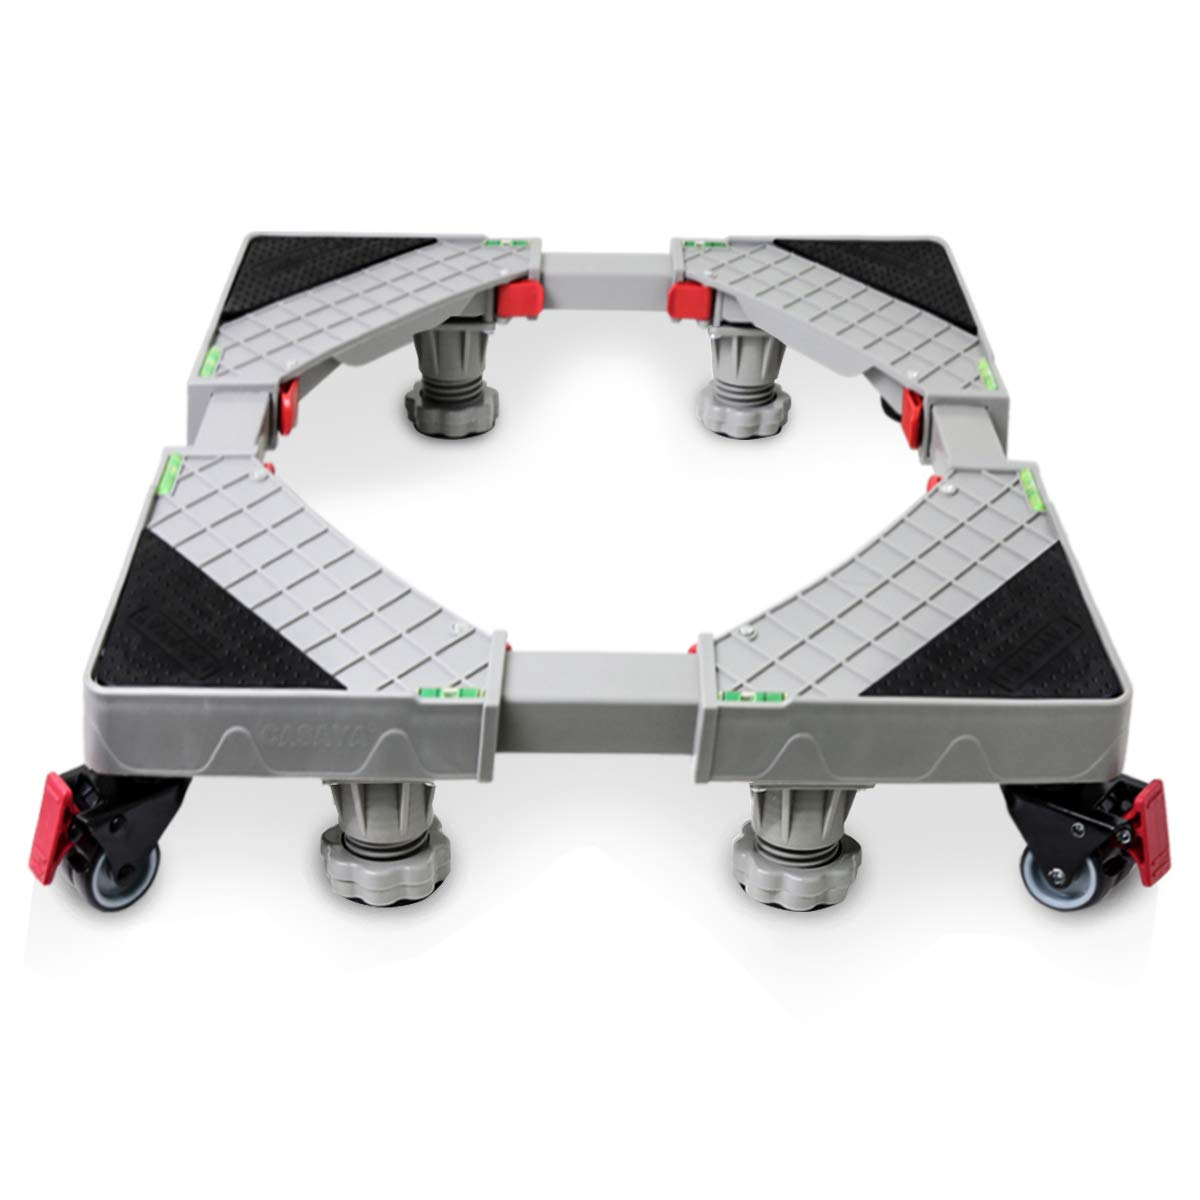 Grandekor Base Lavadora Para Movil Multifuncional Tamaño Ajustable ...